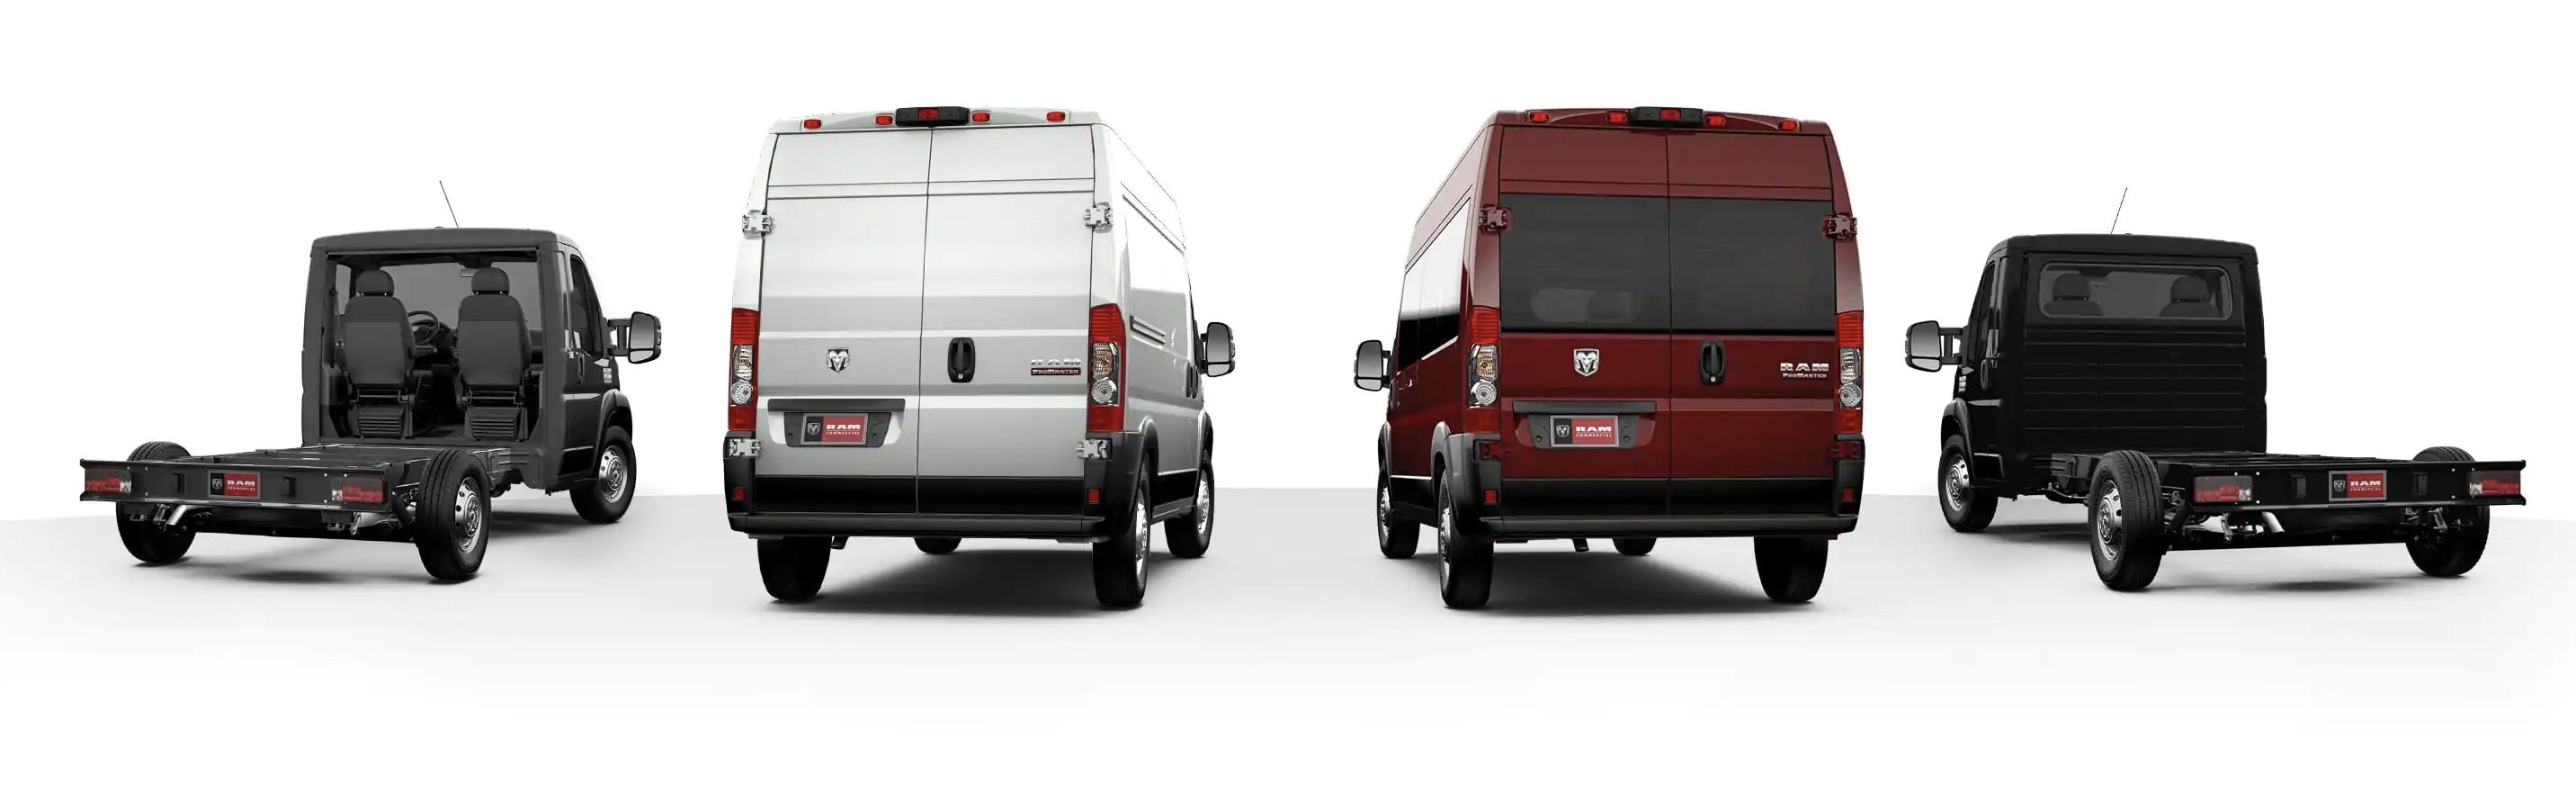 Ram ProMaster Van Lineup